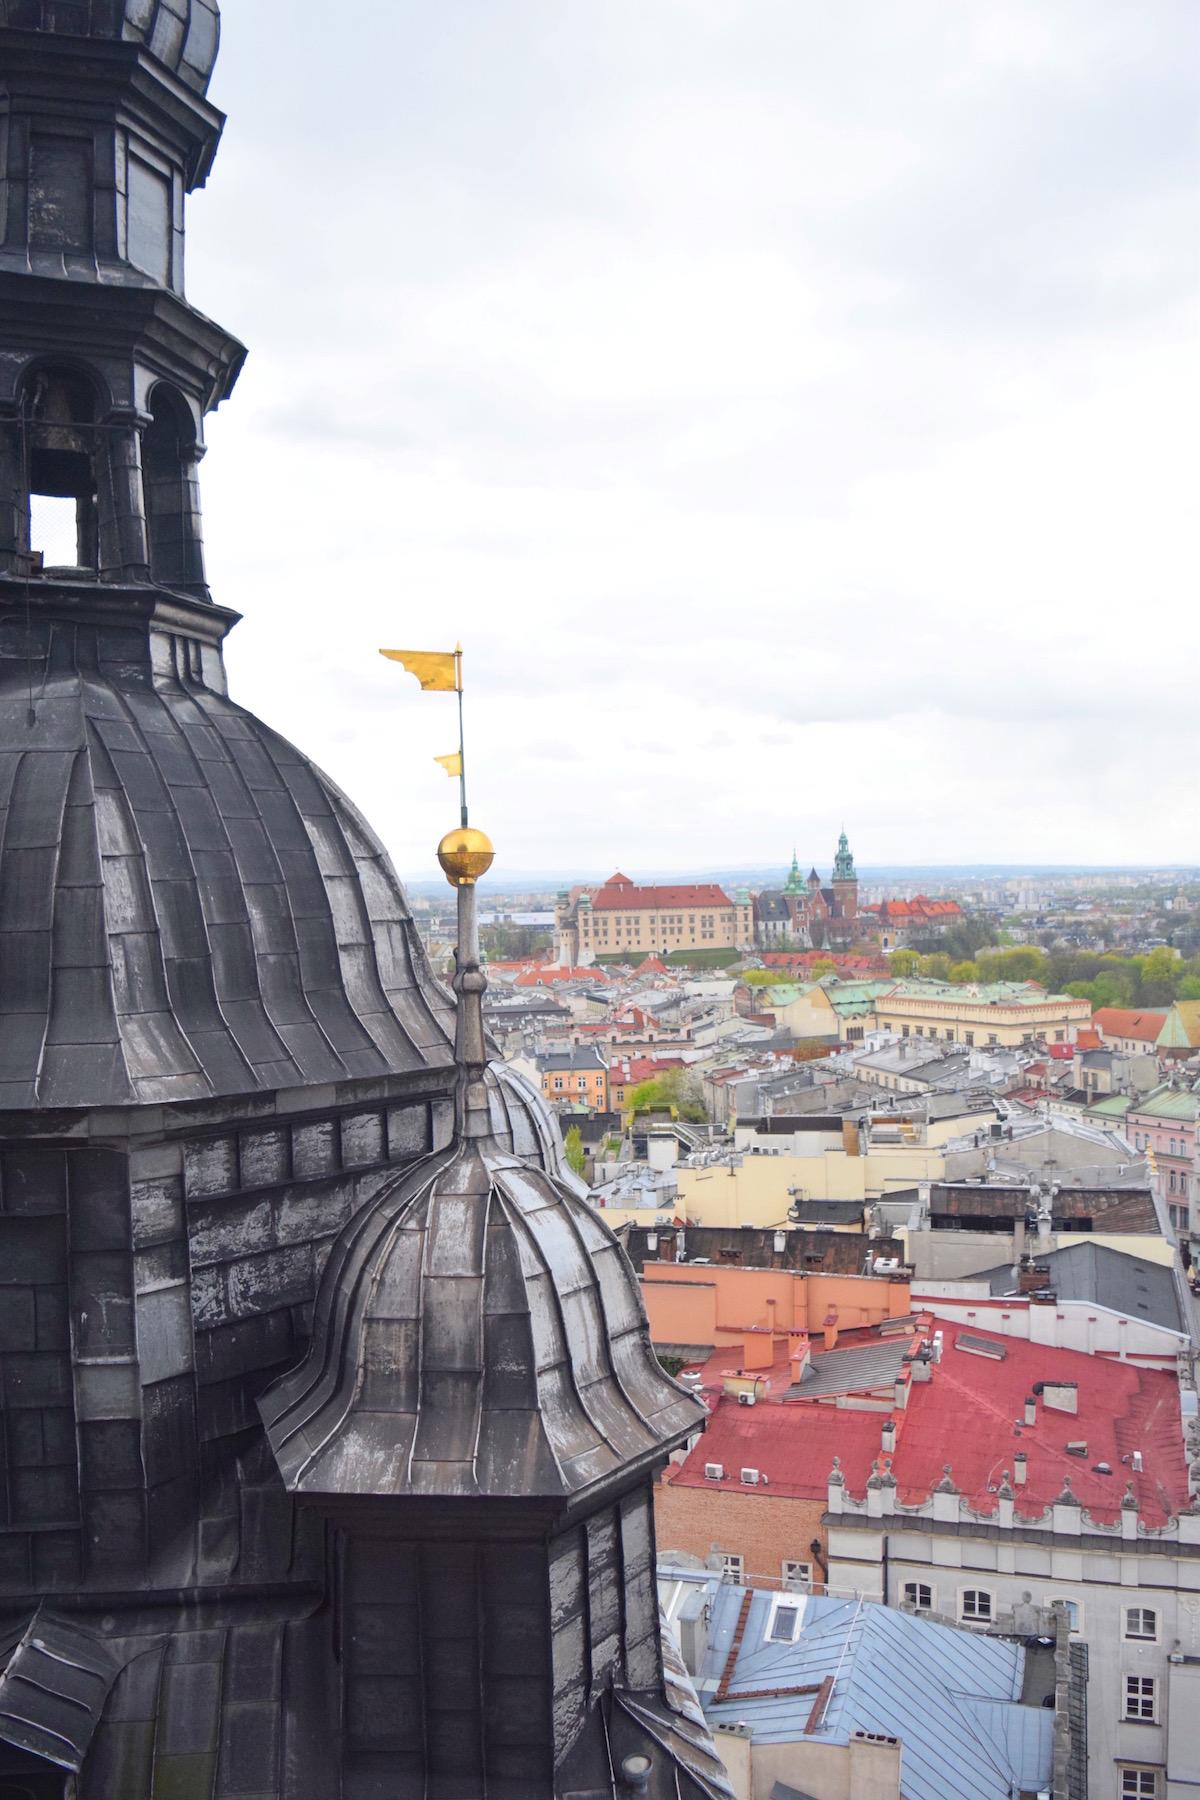 St Marys Church Tower View - Krakow Poland